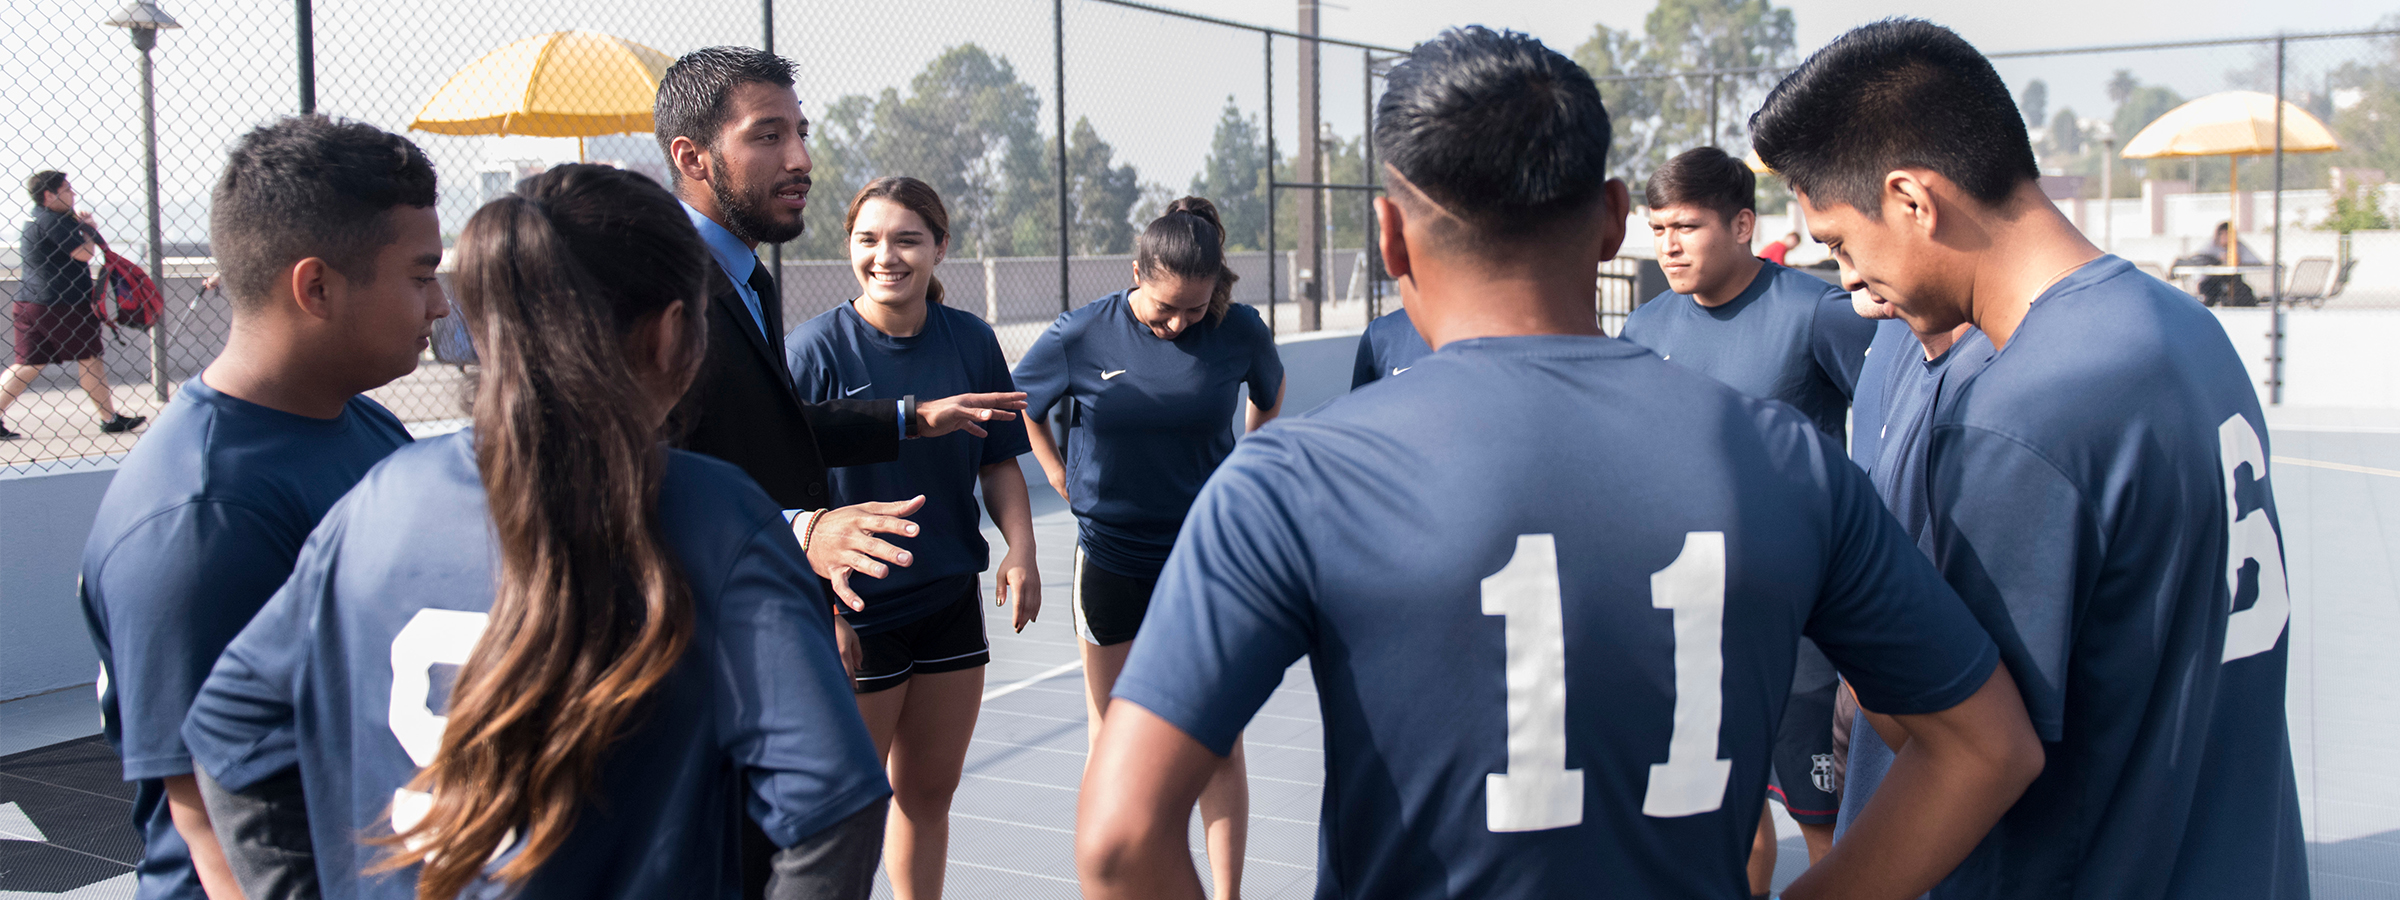 Student players gathered around coach